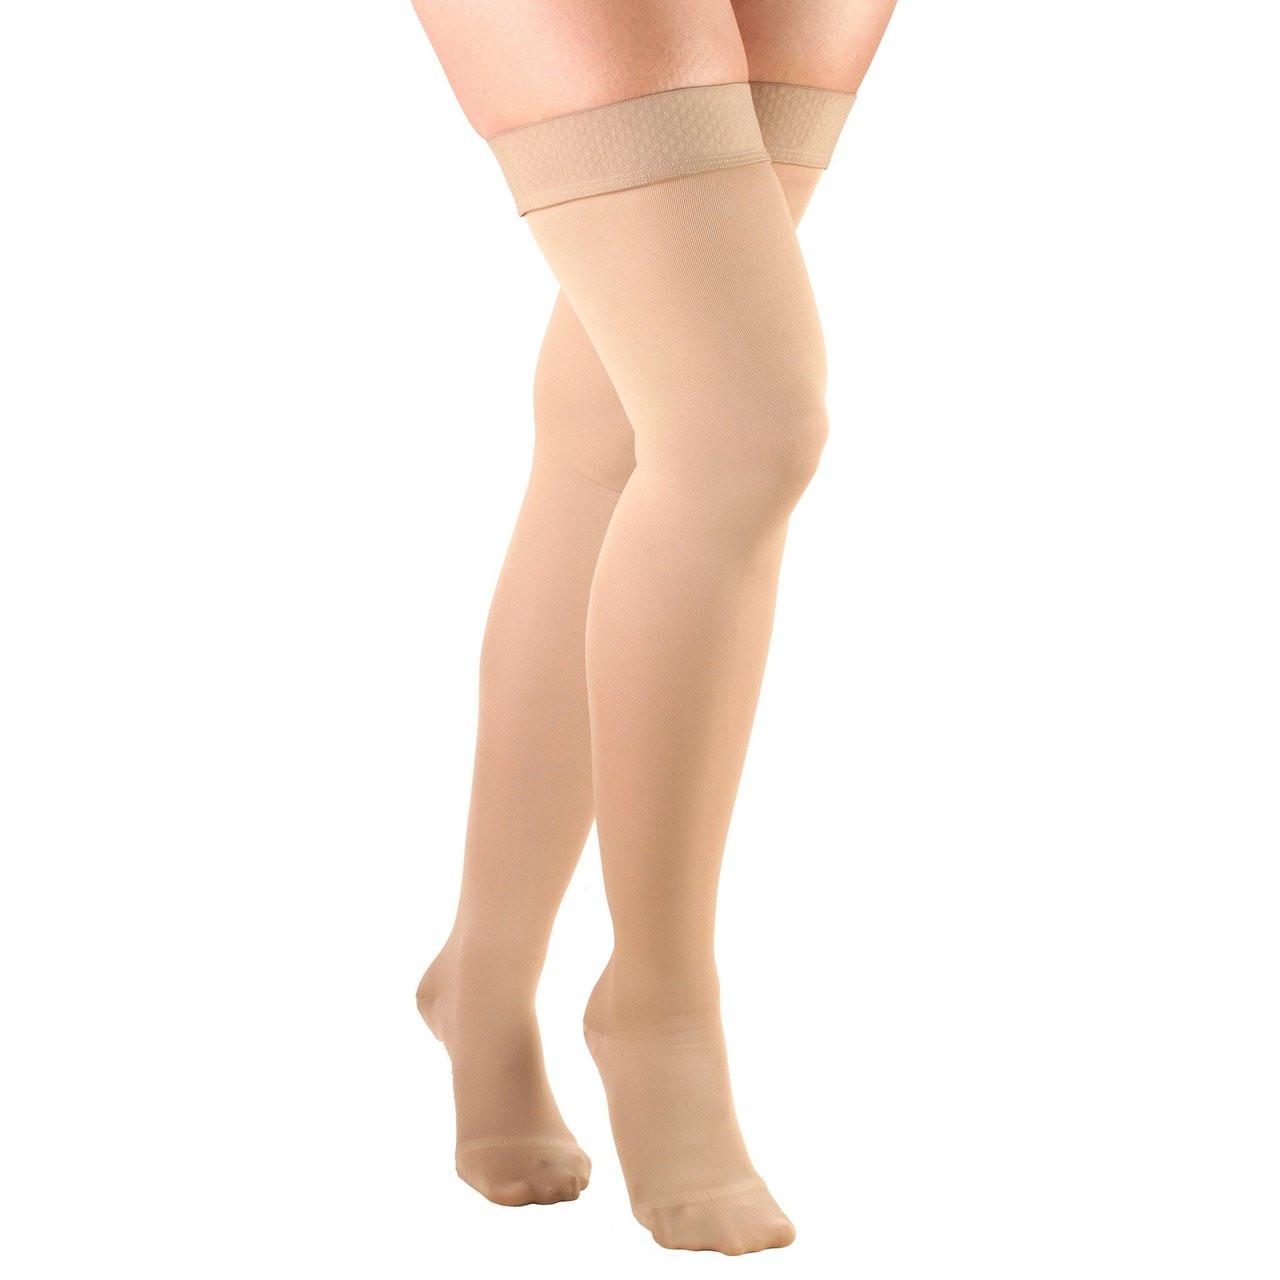 011f247ce66 Truform Opaque - Thigh High 15-20mmHg - Select Socks Inc.